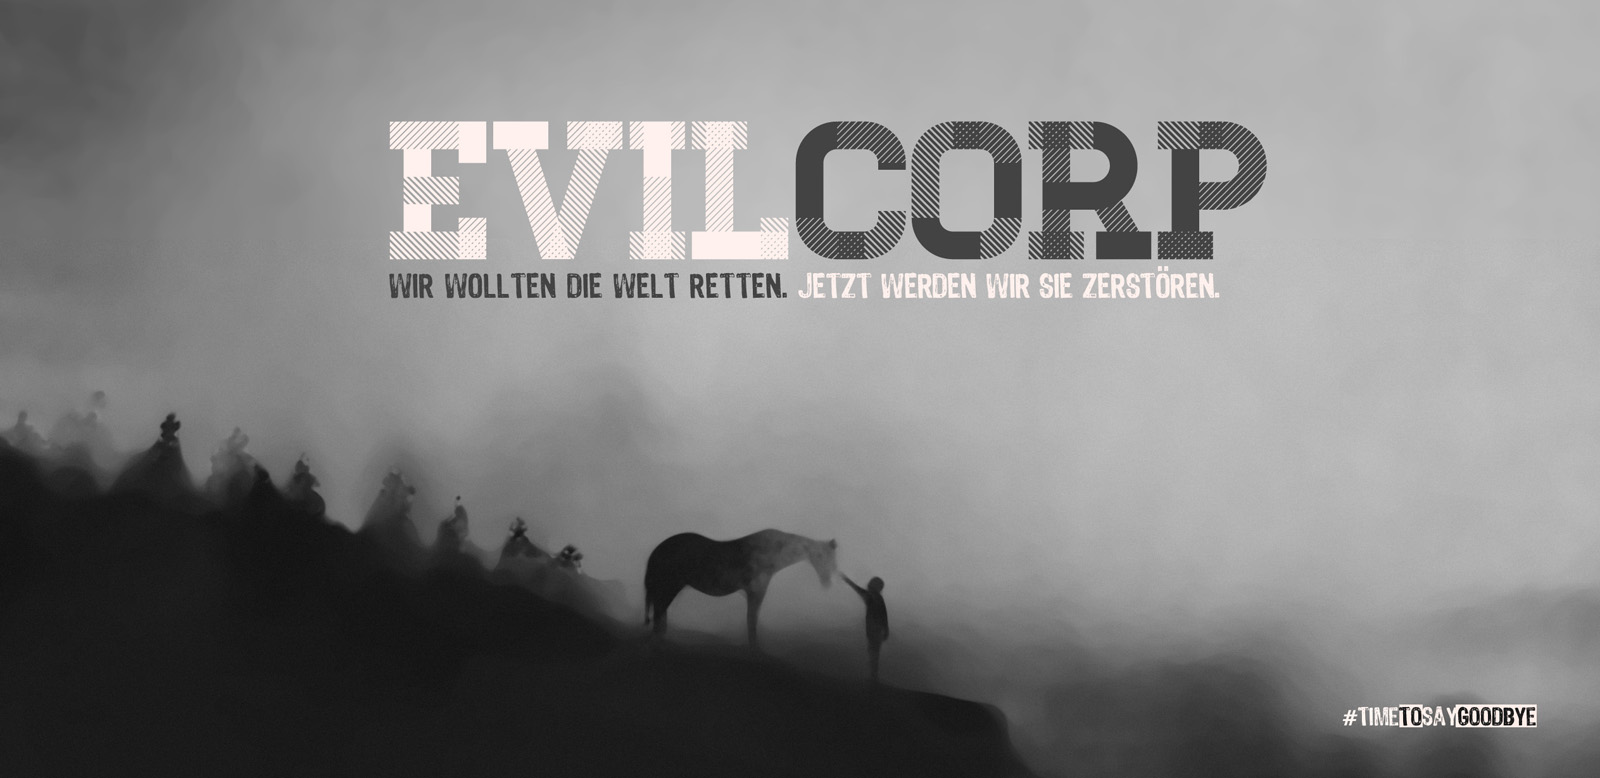 EvilCorpSagtDanke2